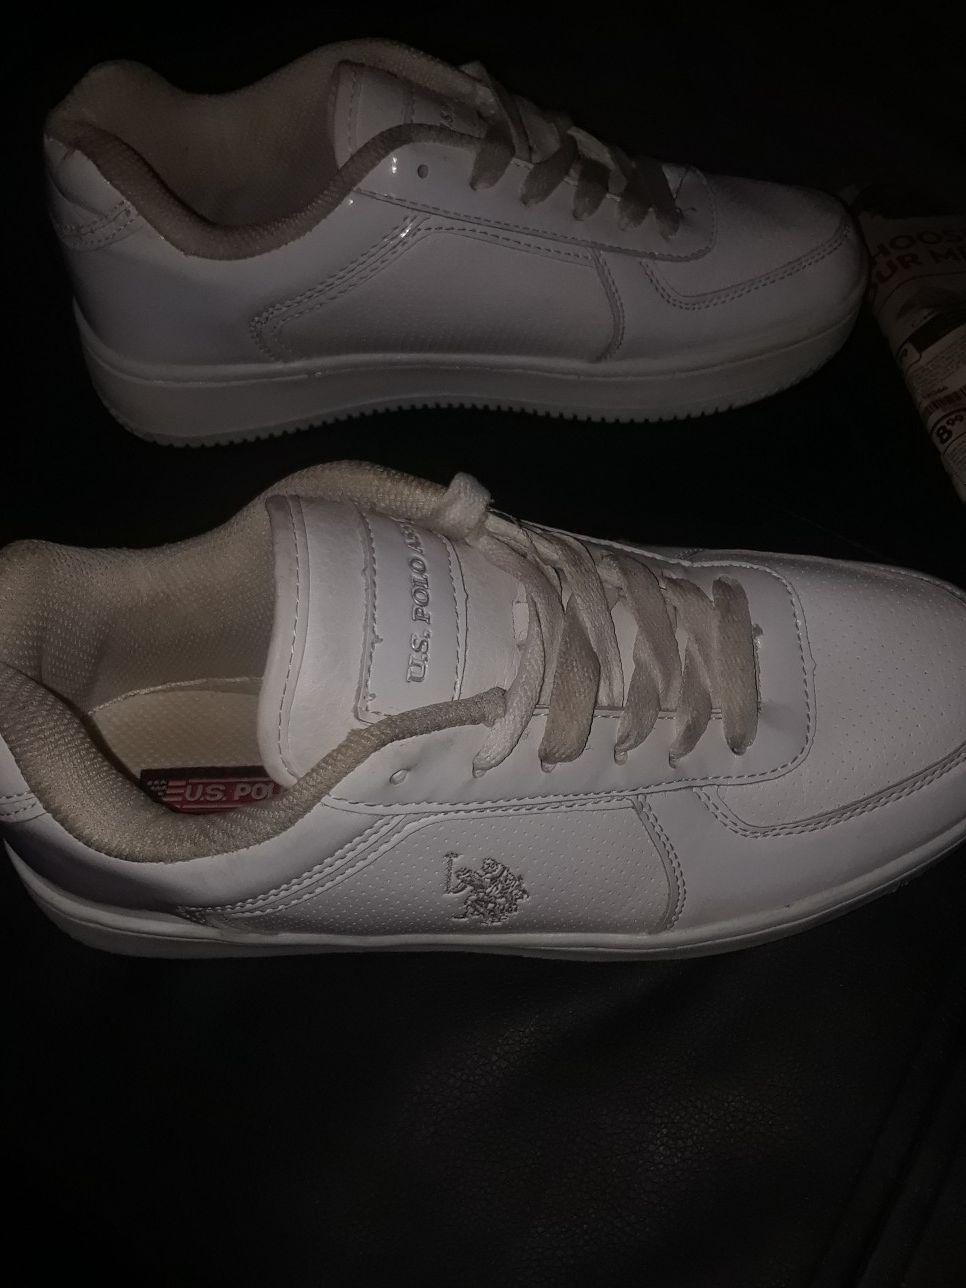 U.s. Polo assassin tennis shoes